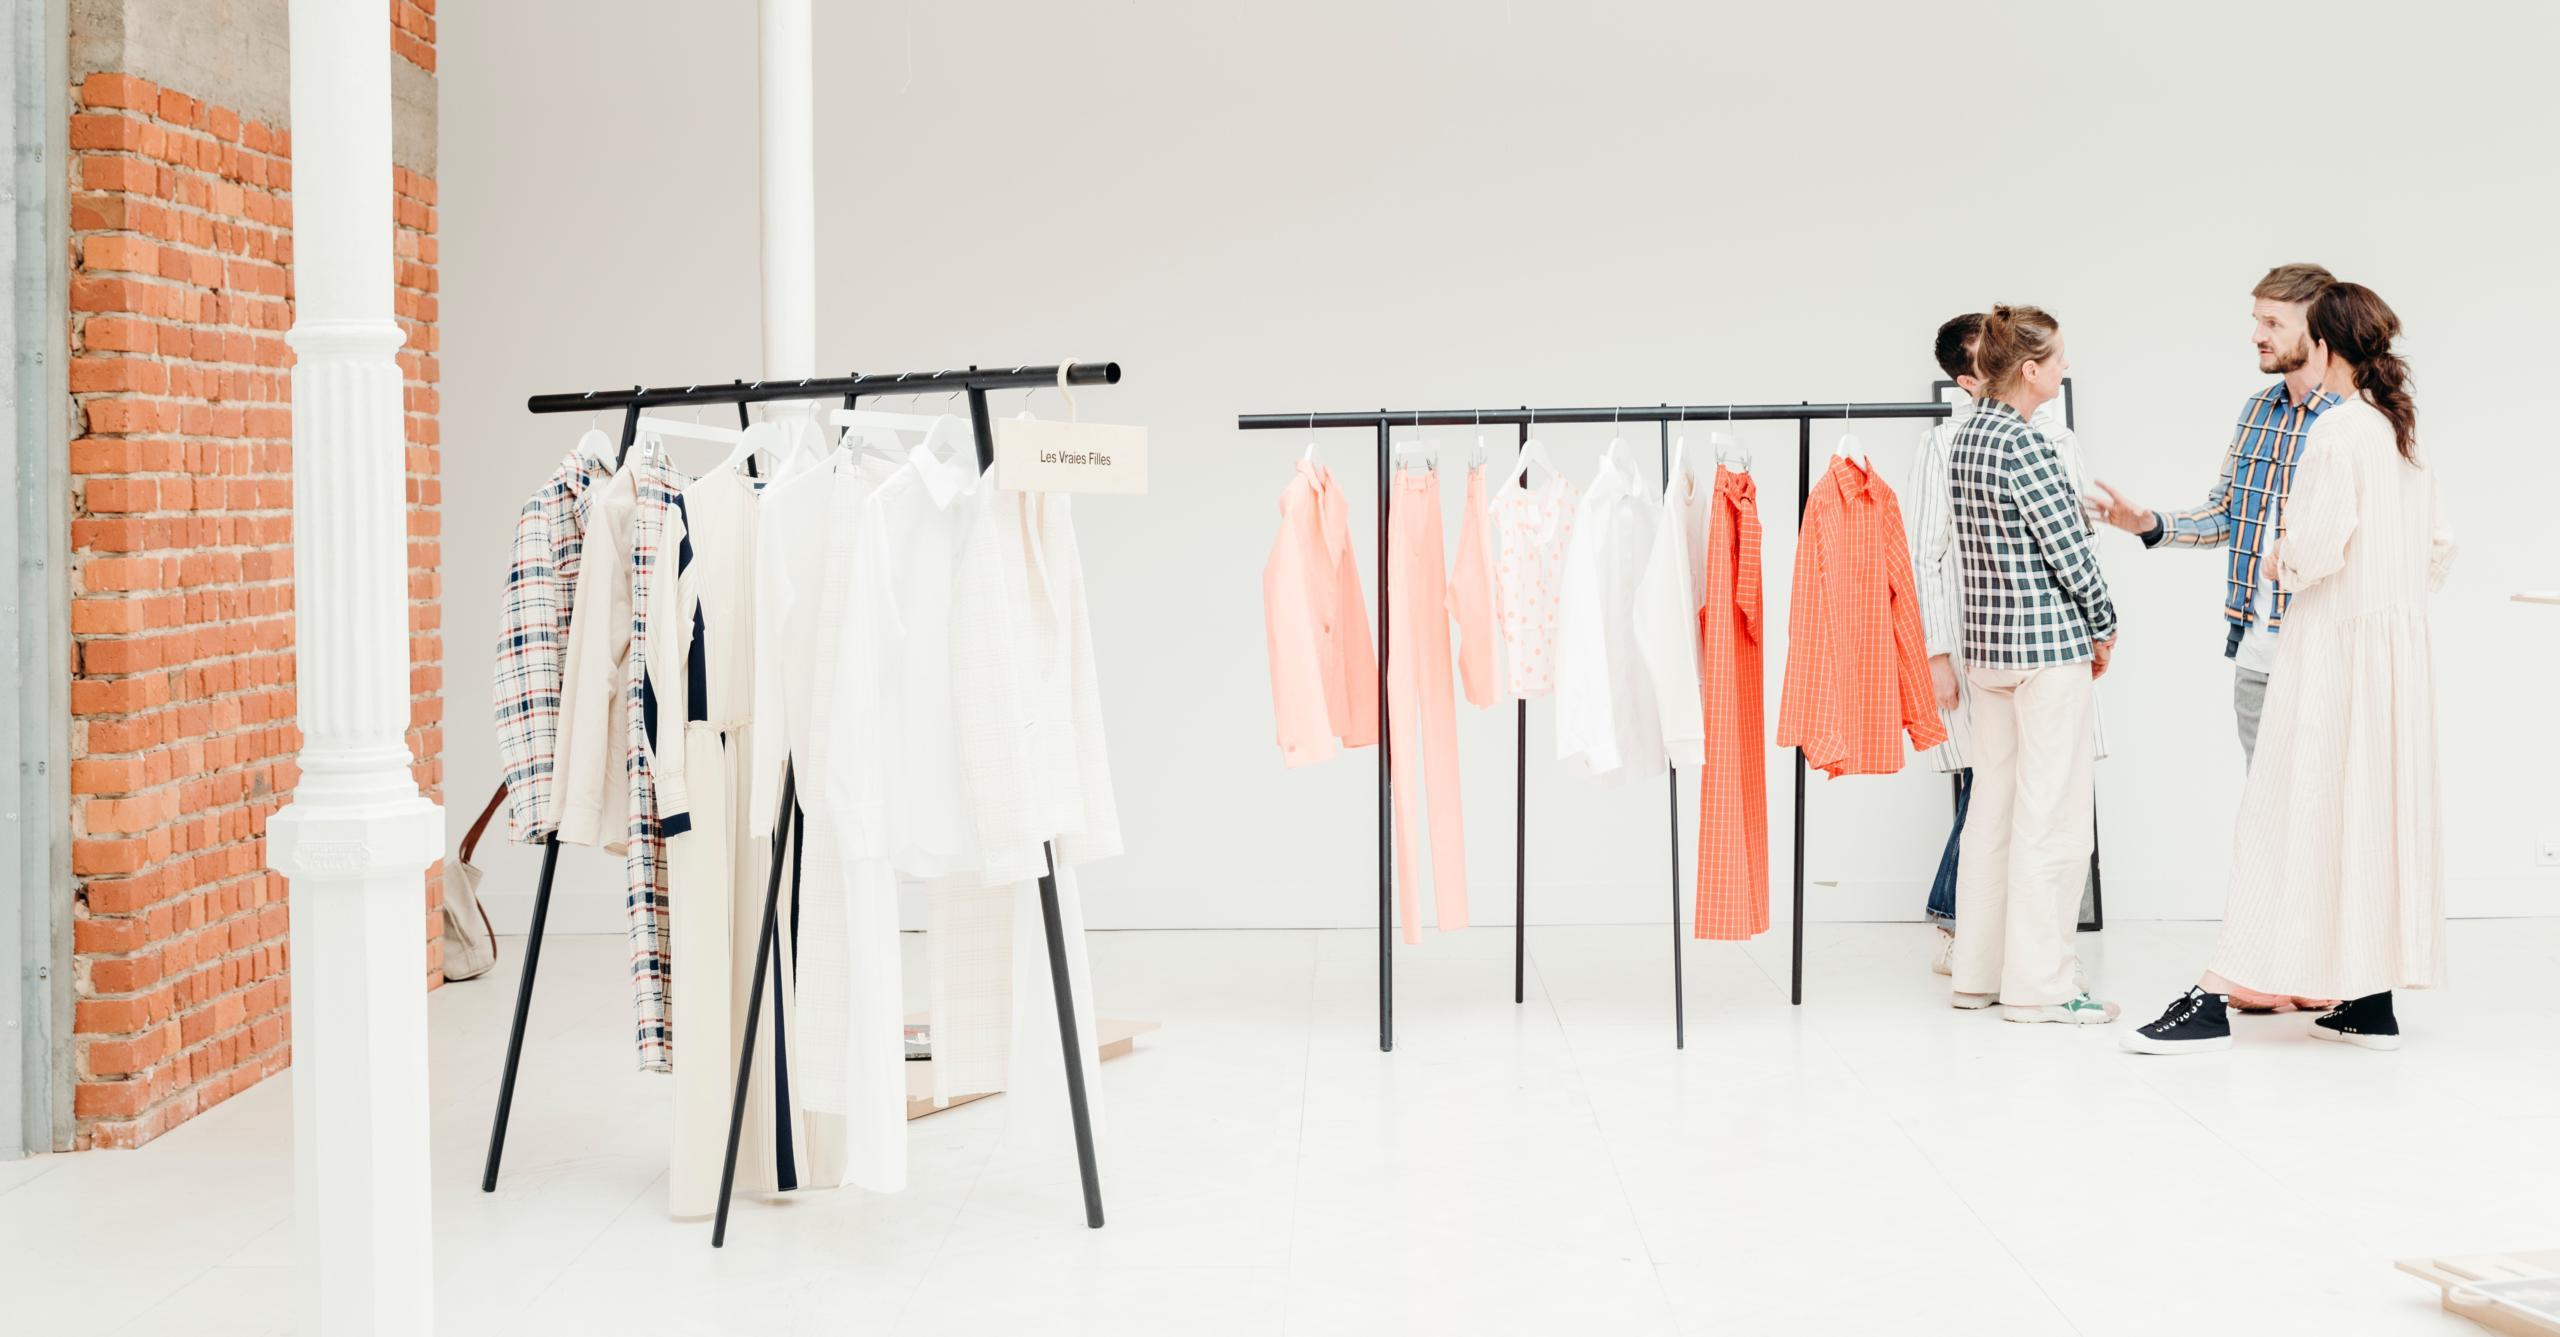 [POSTPONED] Sustainable international showroom